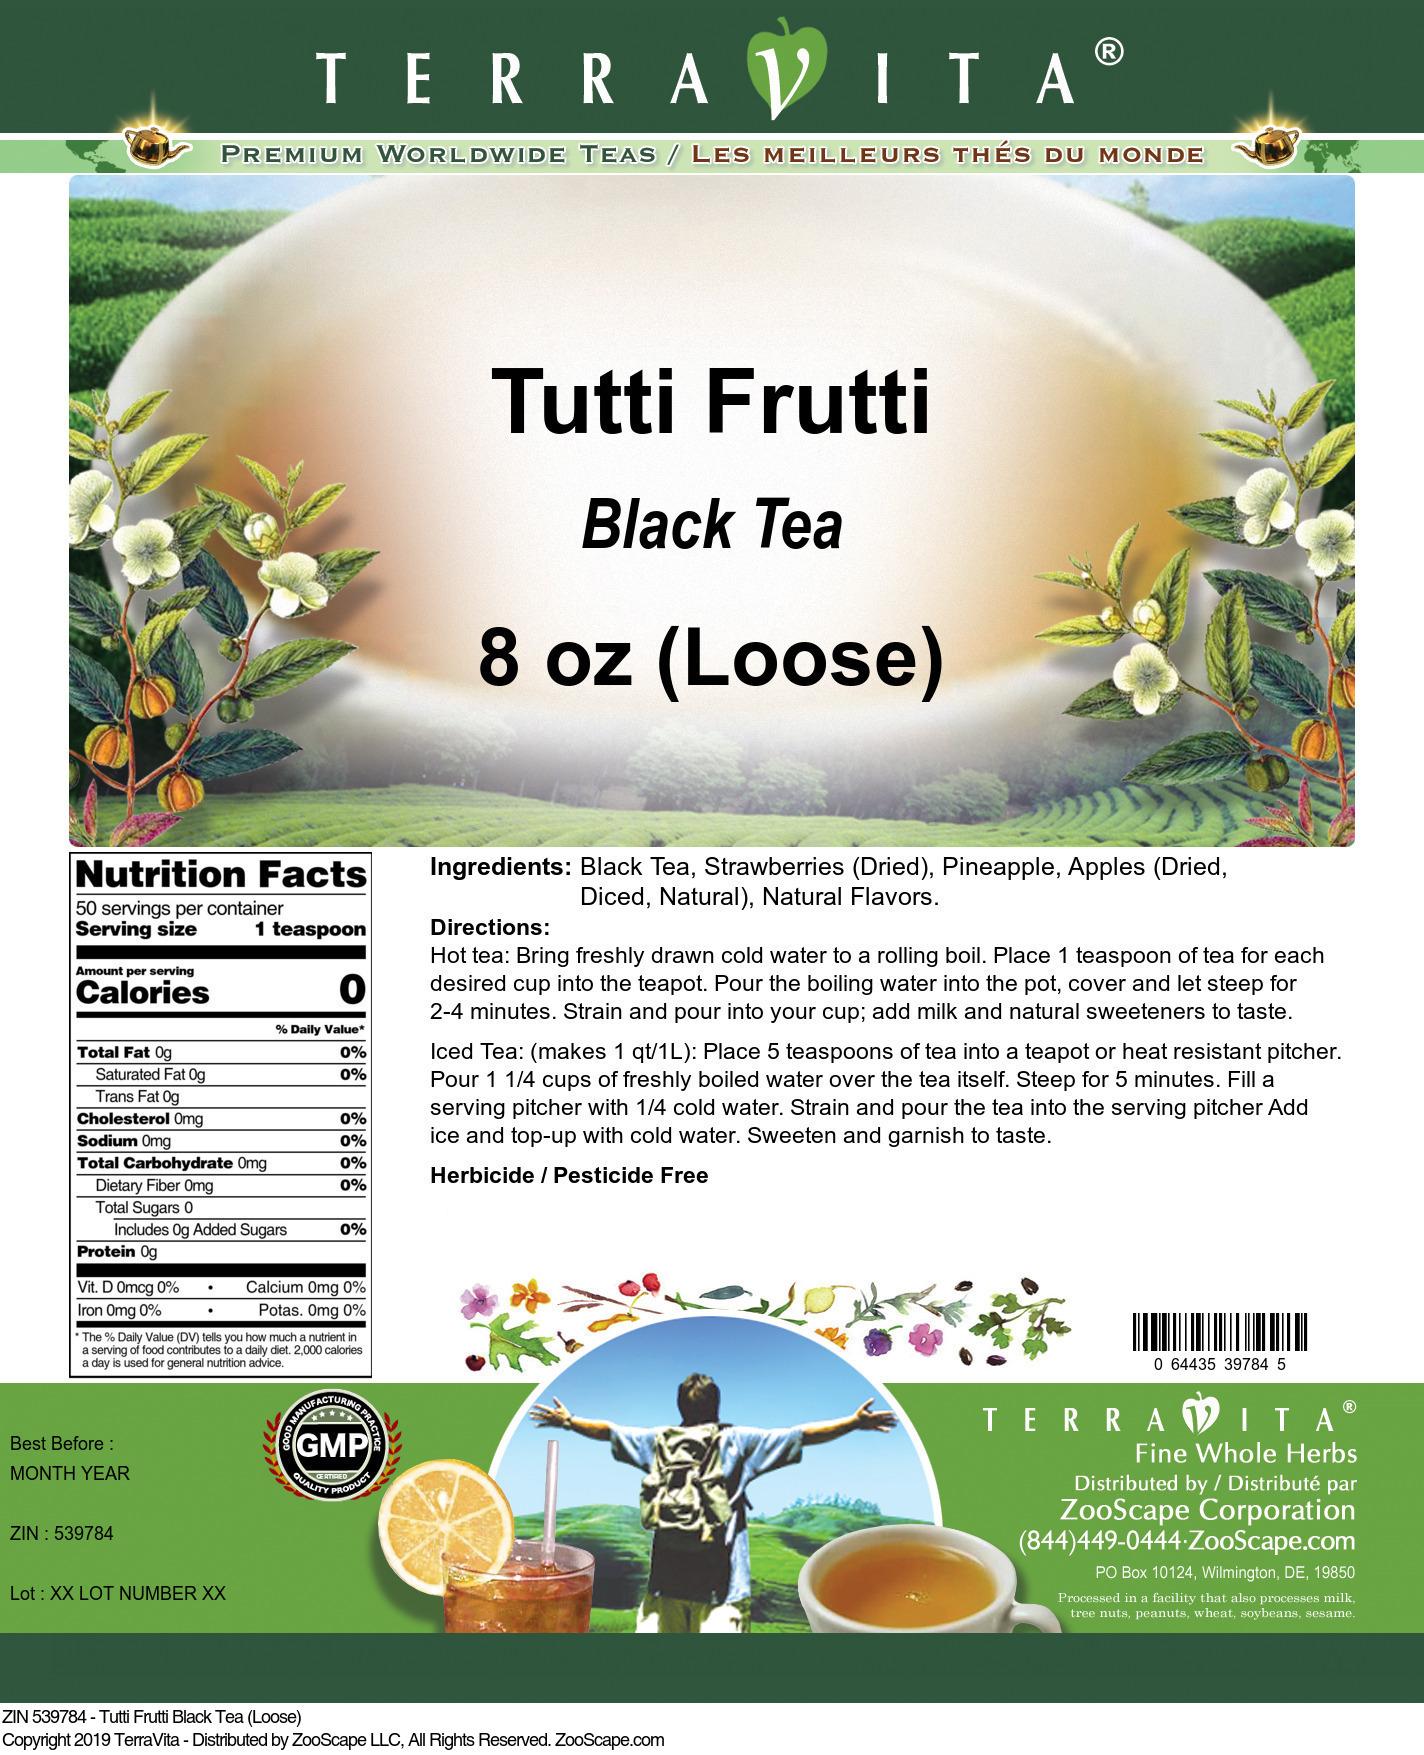 Tutti Frutti Black Tea (Loose)